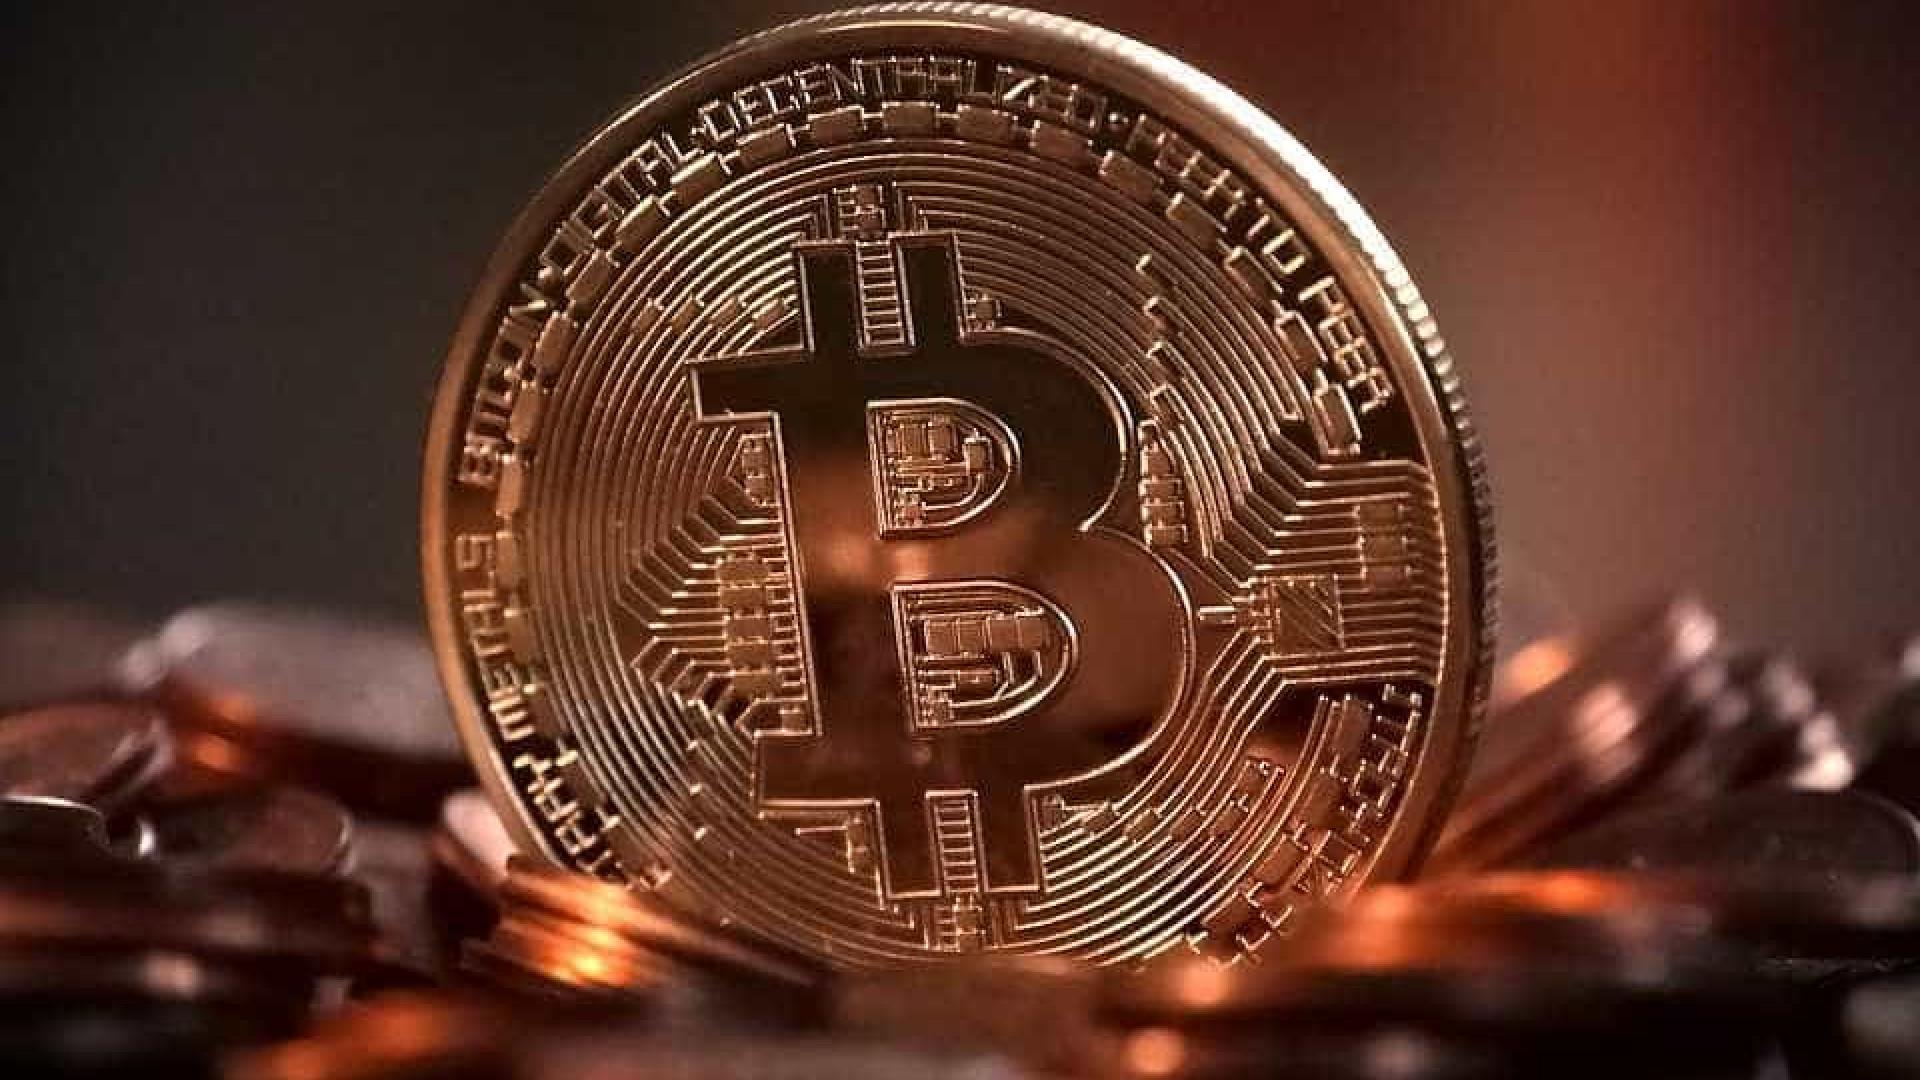 Nova Bolsa brasileira financiará empresas com mercado de criptomoedas